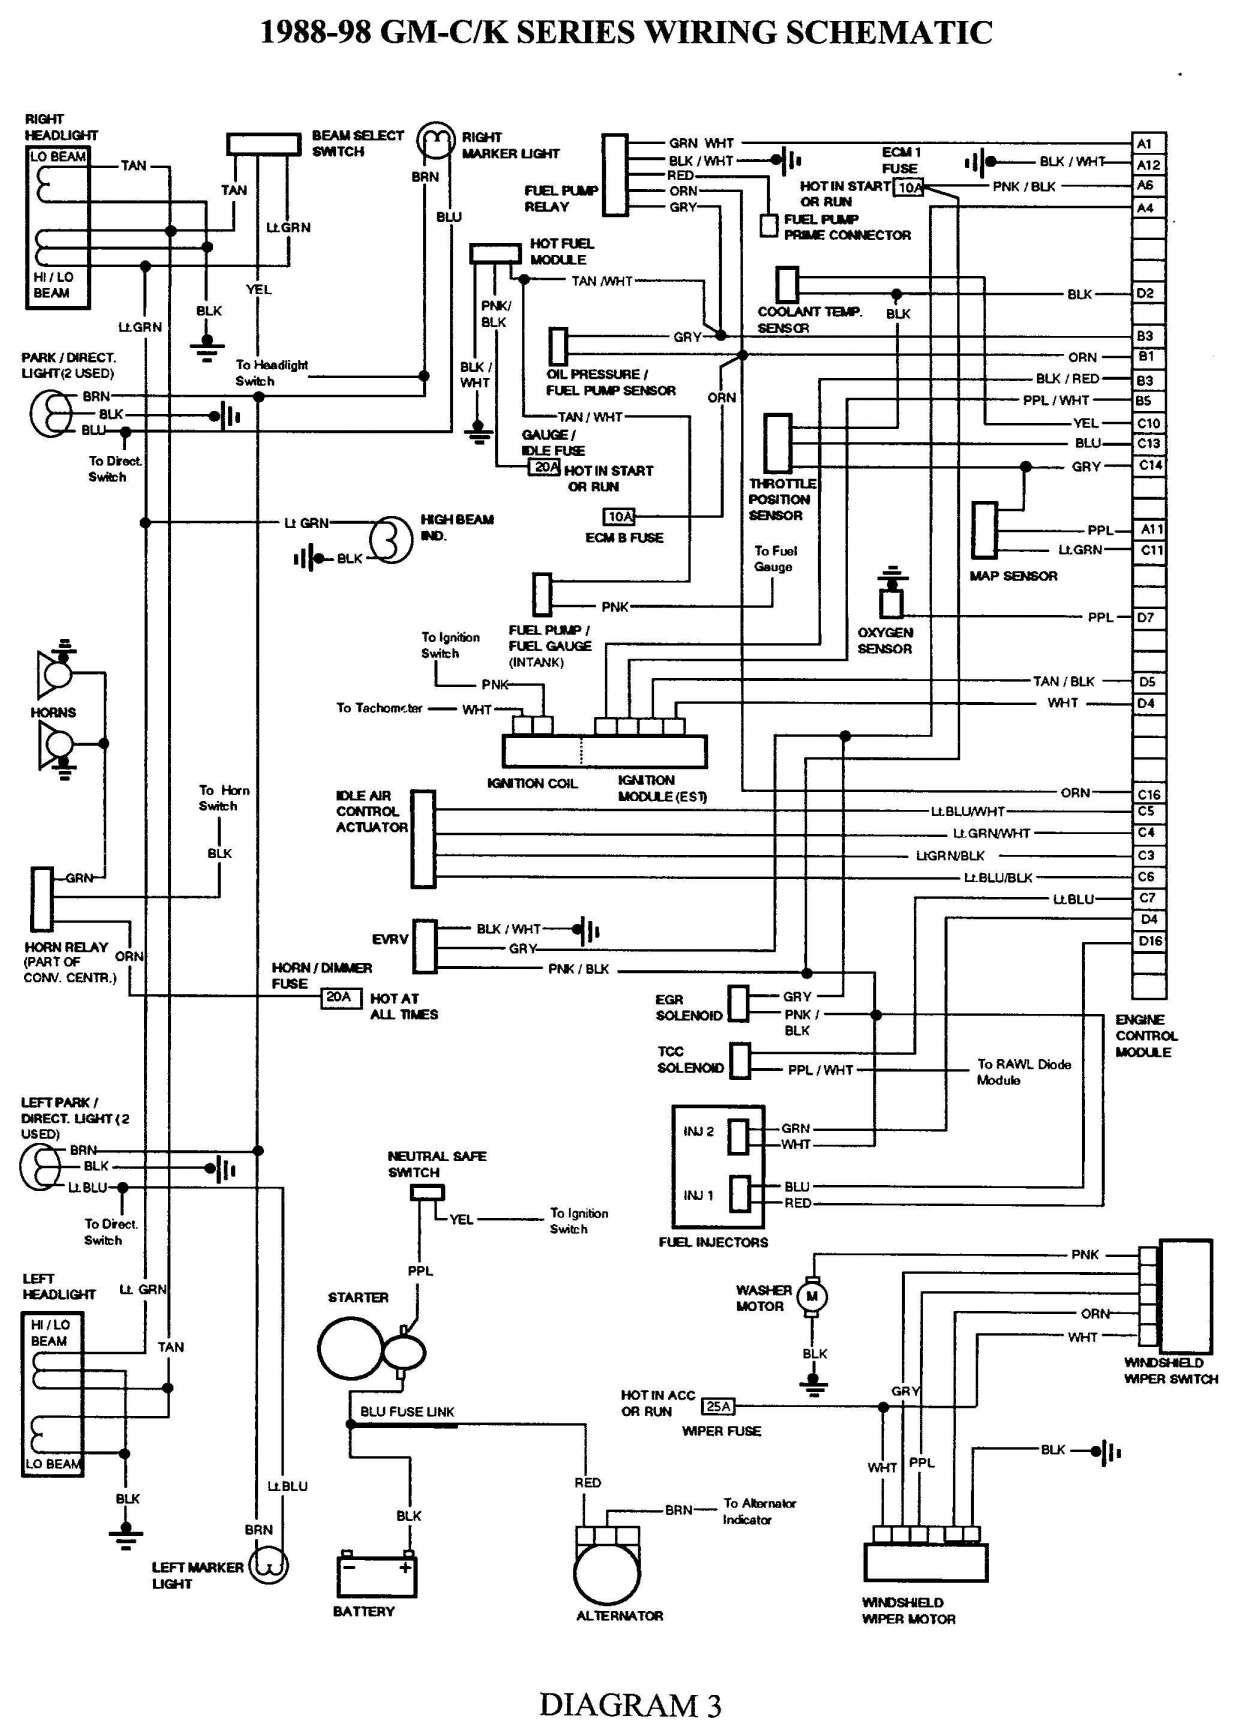 10 1992 3500chevy Truck Wiring Diagram Truck Diagram In 2020